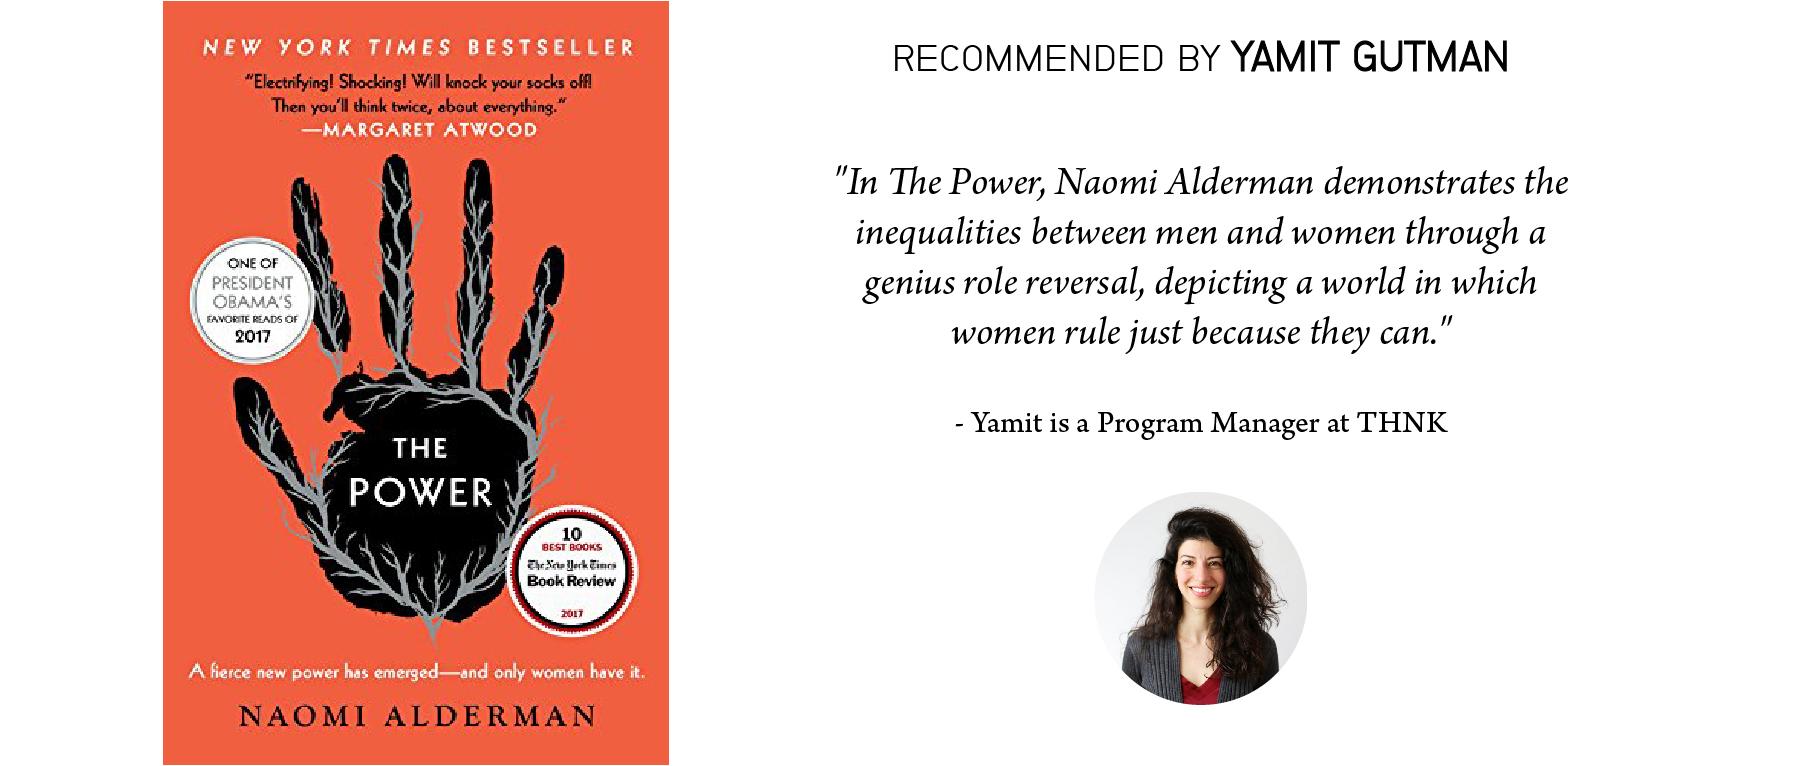 books to ignite your inner feminist